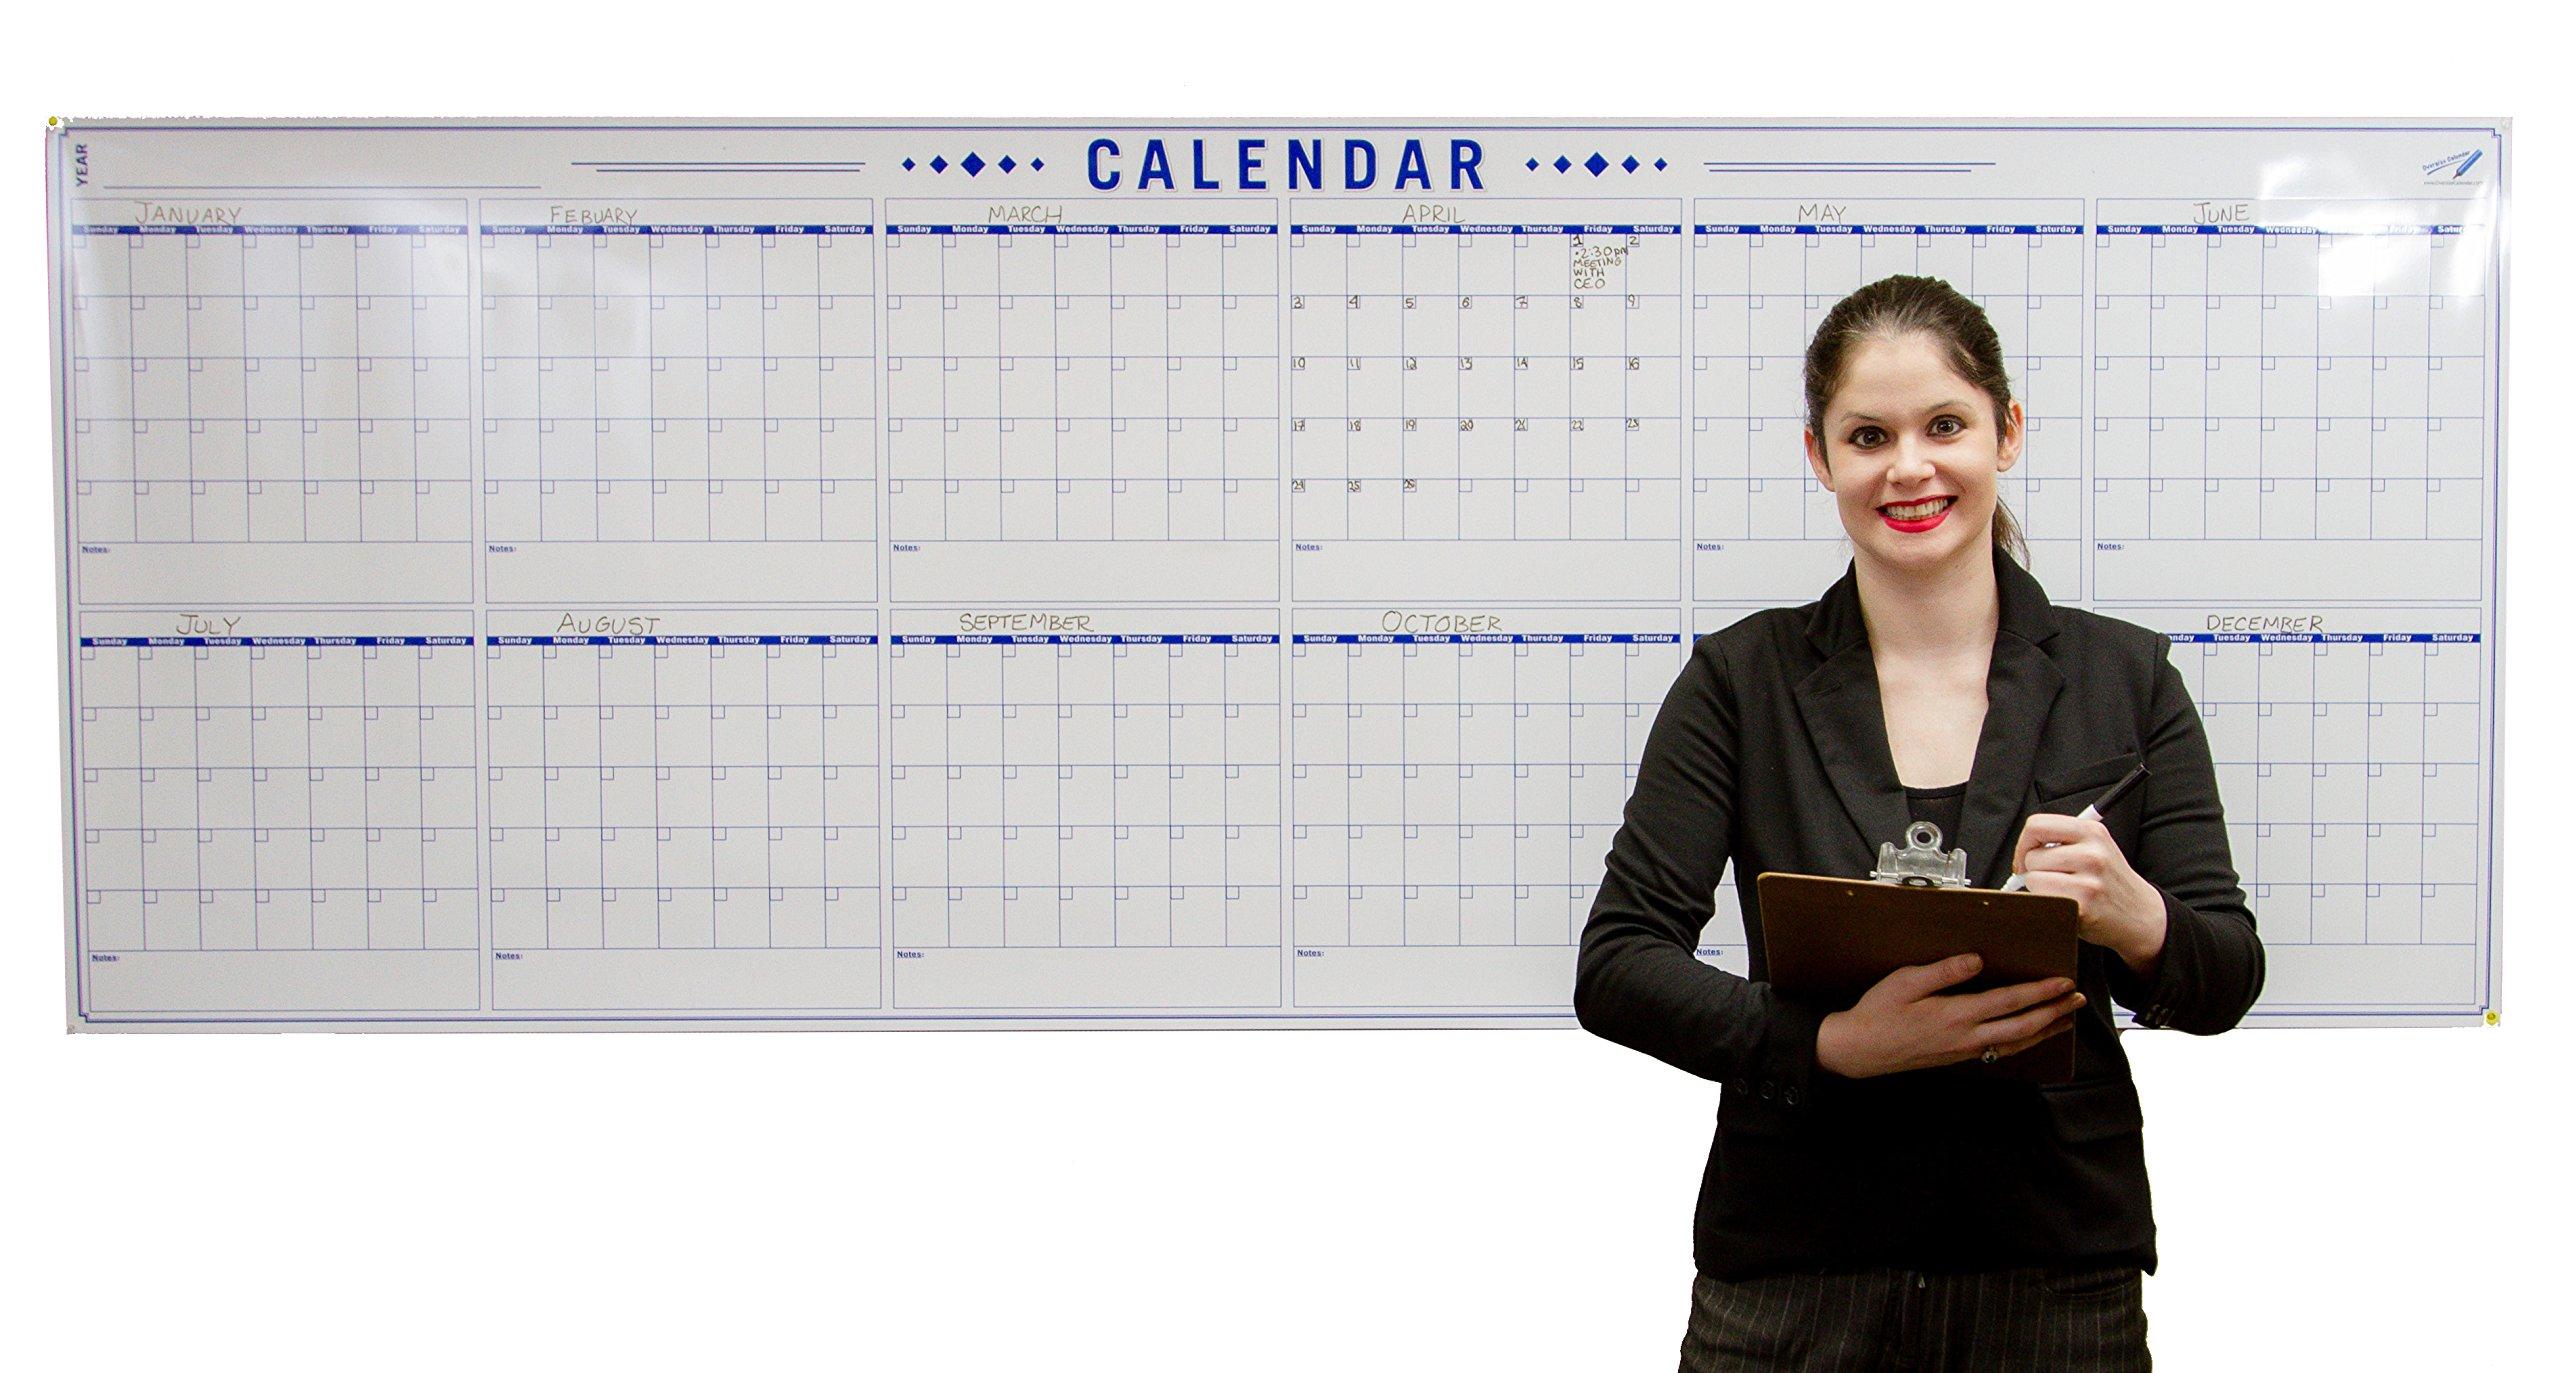 Jumbo 36 x 96 inch Blank Yearly Wall Calendar - Big Laminated Calendar Poster - 12 Month Planner - Erasable - Reusable - Giant Wet Erase Calendar - Annual Planning - Large Dry Erase Calendar by Oversize Planner by ABI Digital Solutions